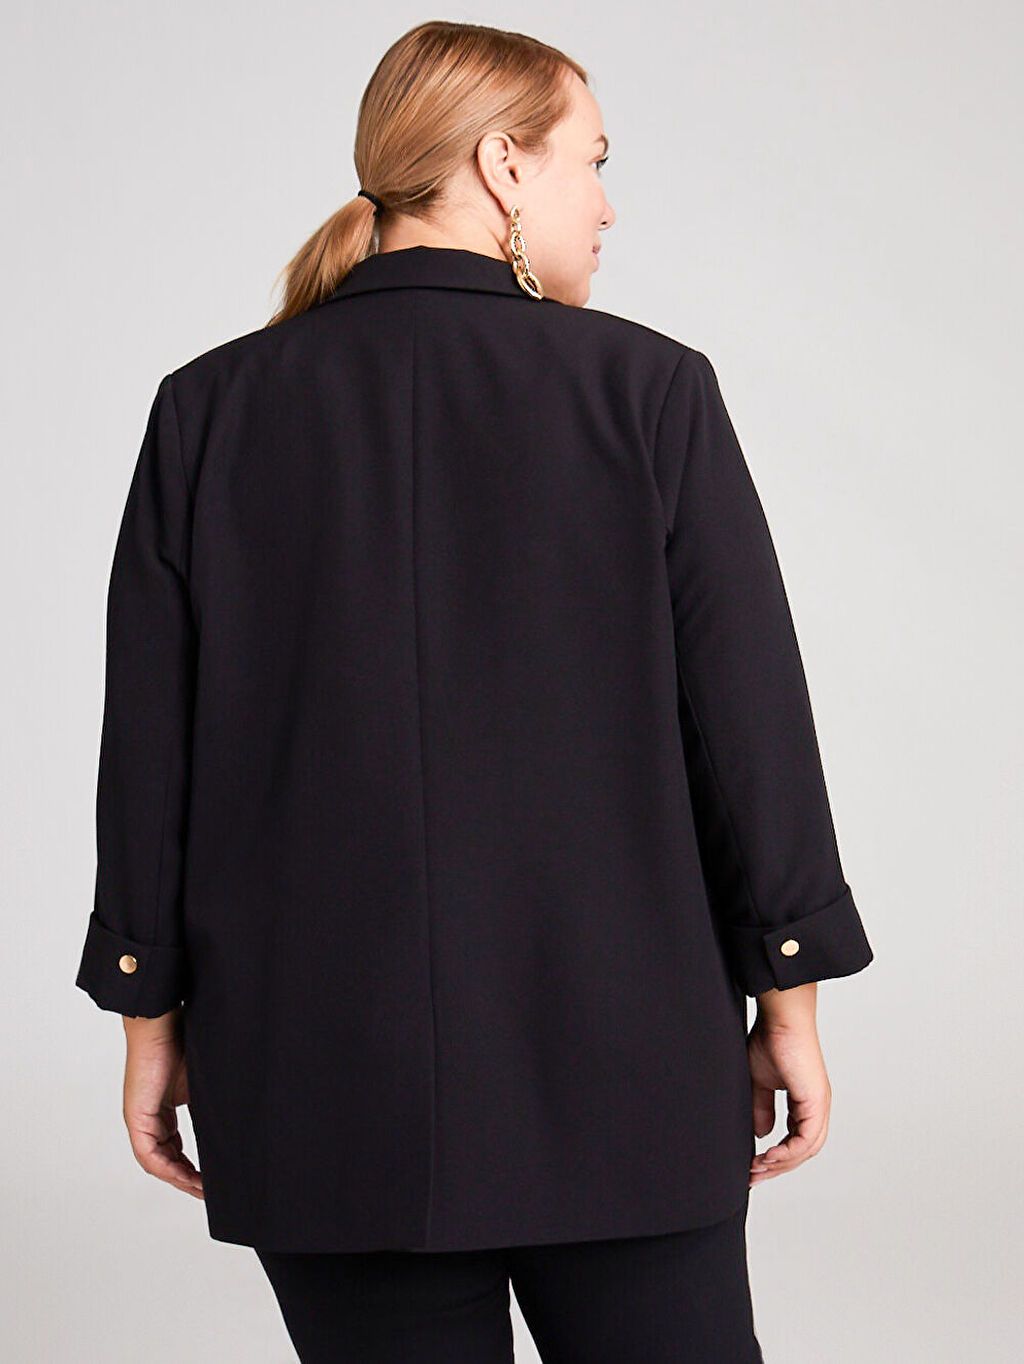 LC Waikiki Siyah Esnek Blazer Ceket